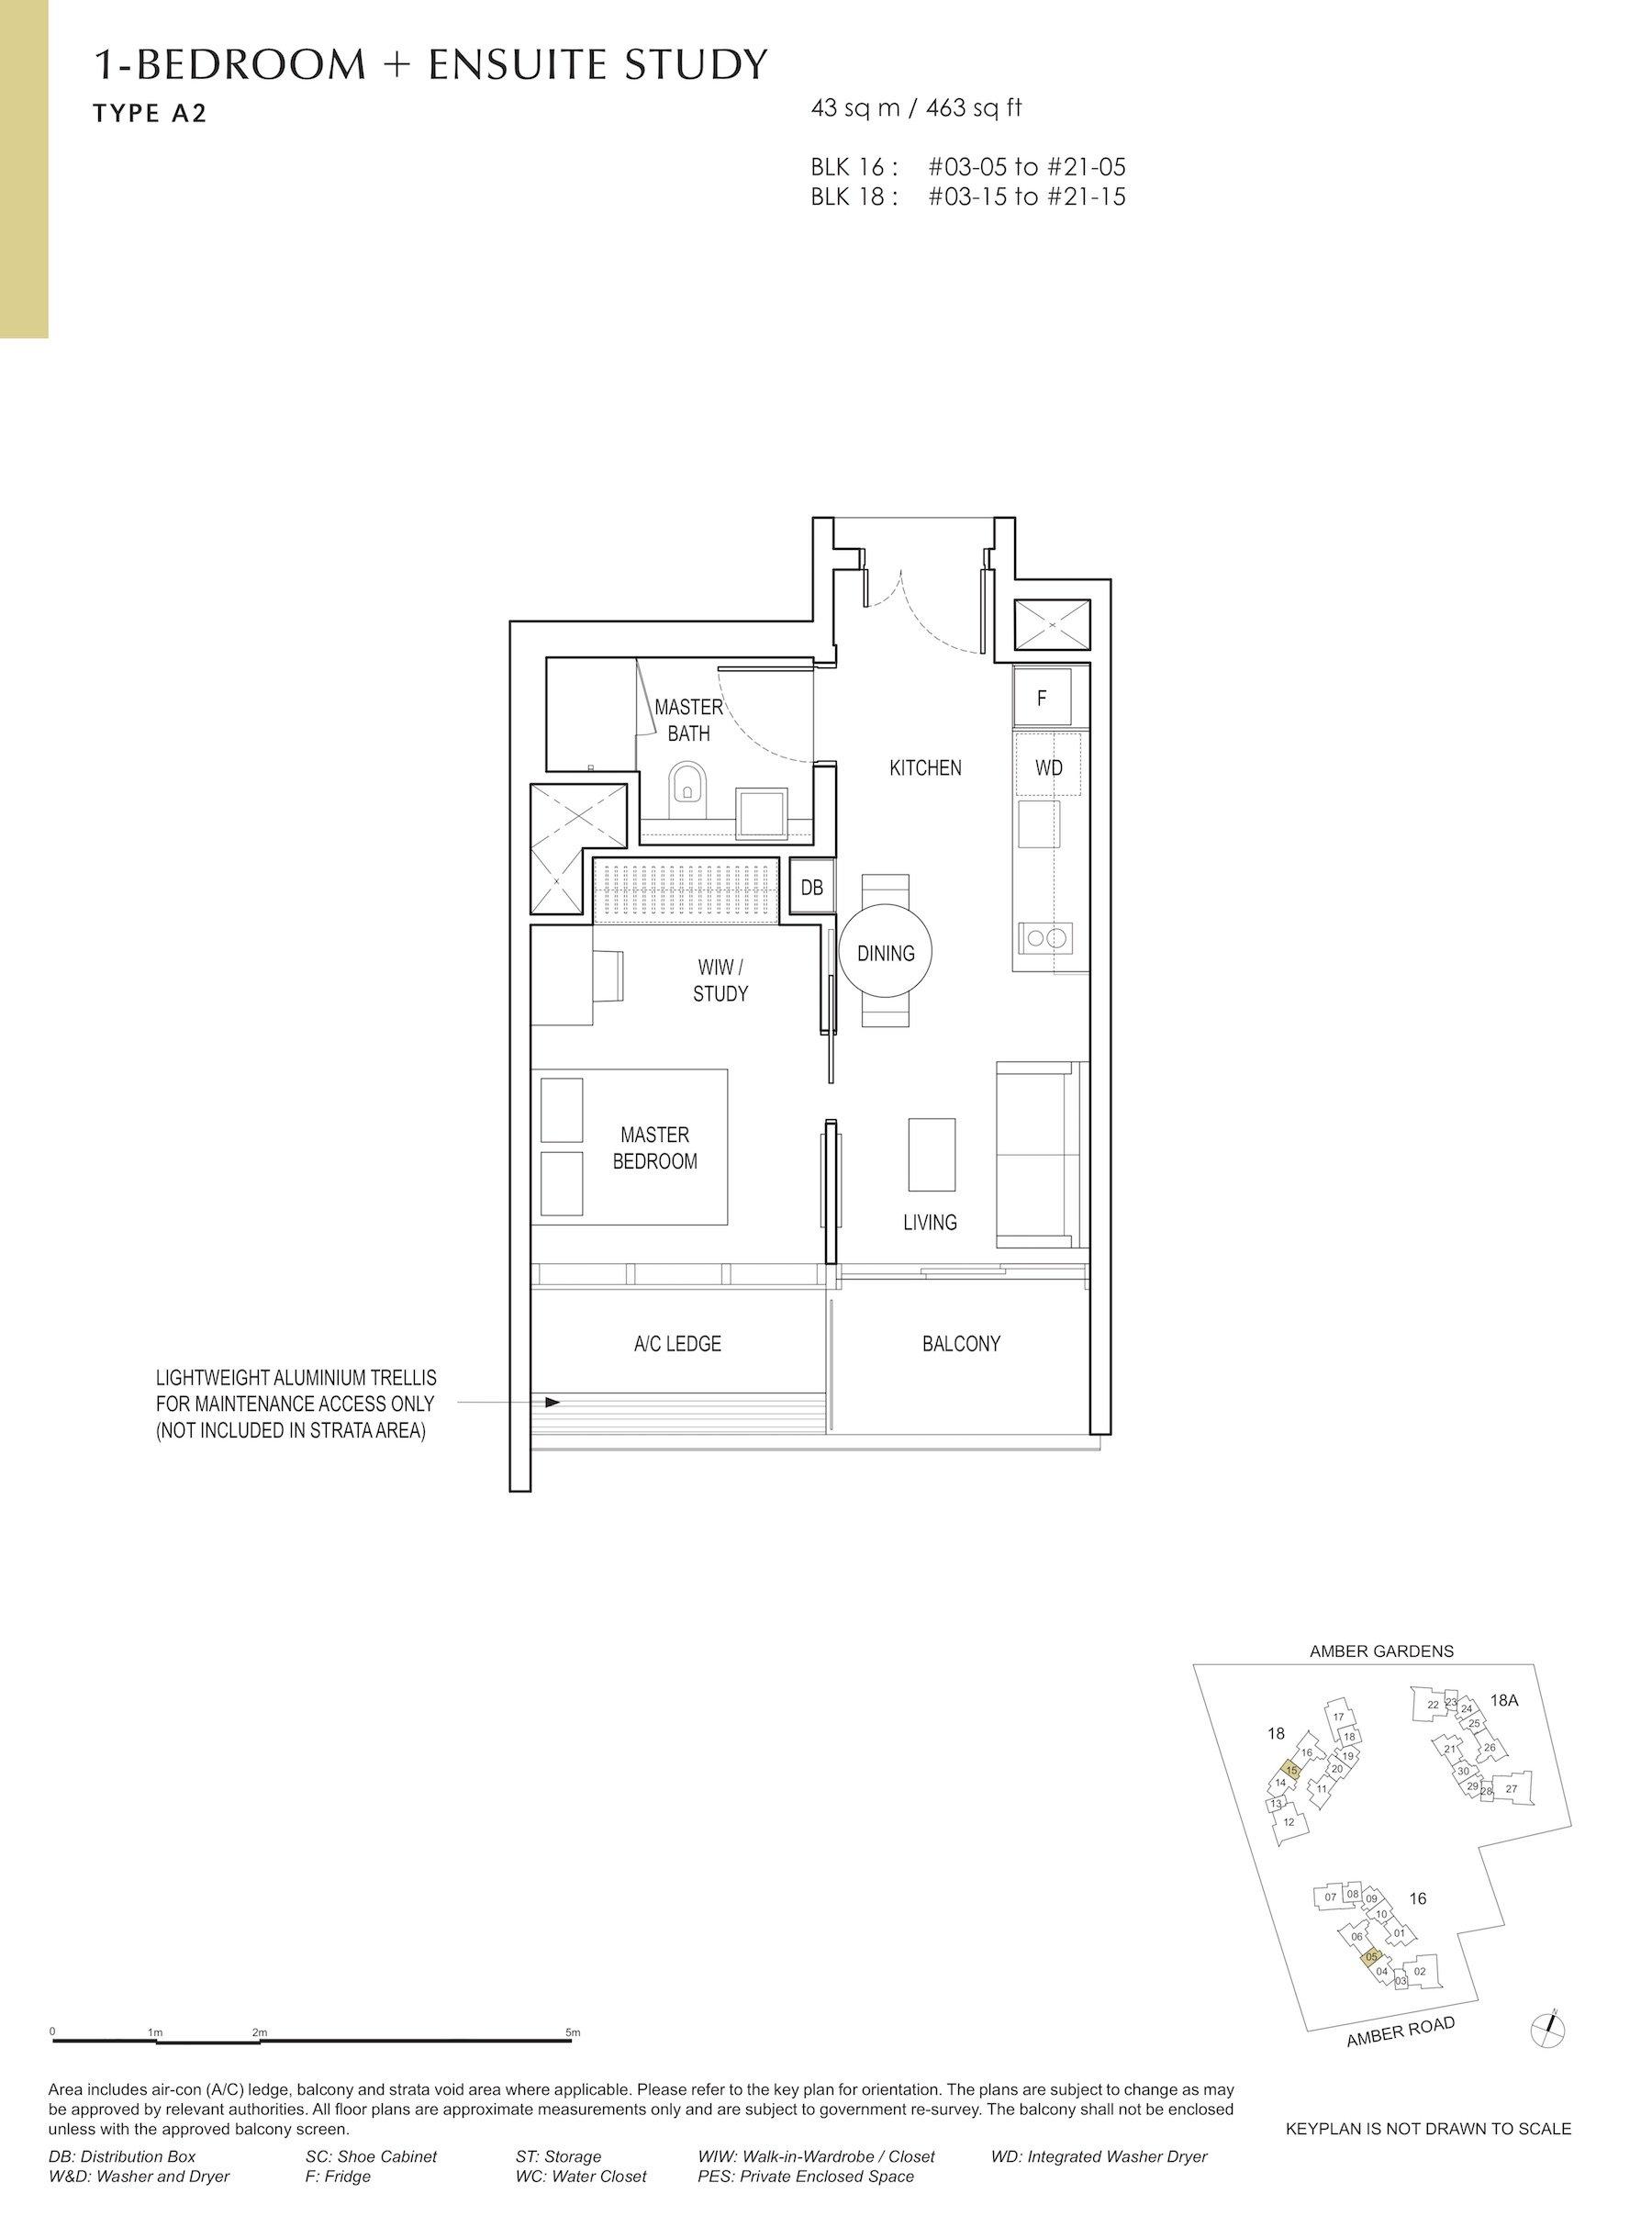 Amber Park 安铂苑 floor plan 1 bedroom + study 1卧房+书房 A2